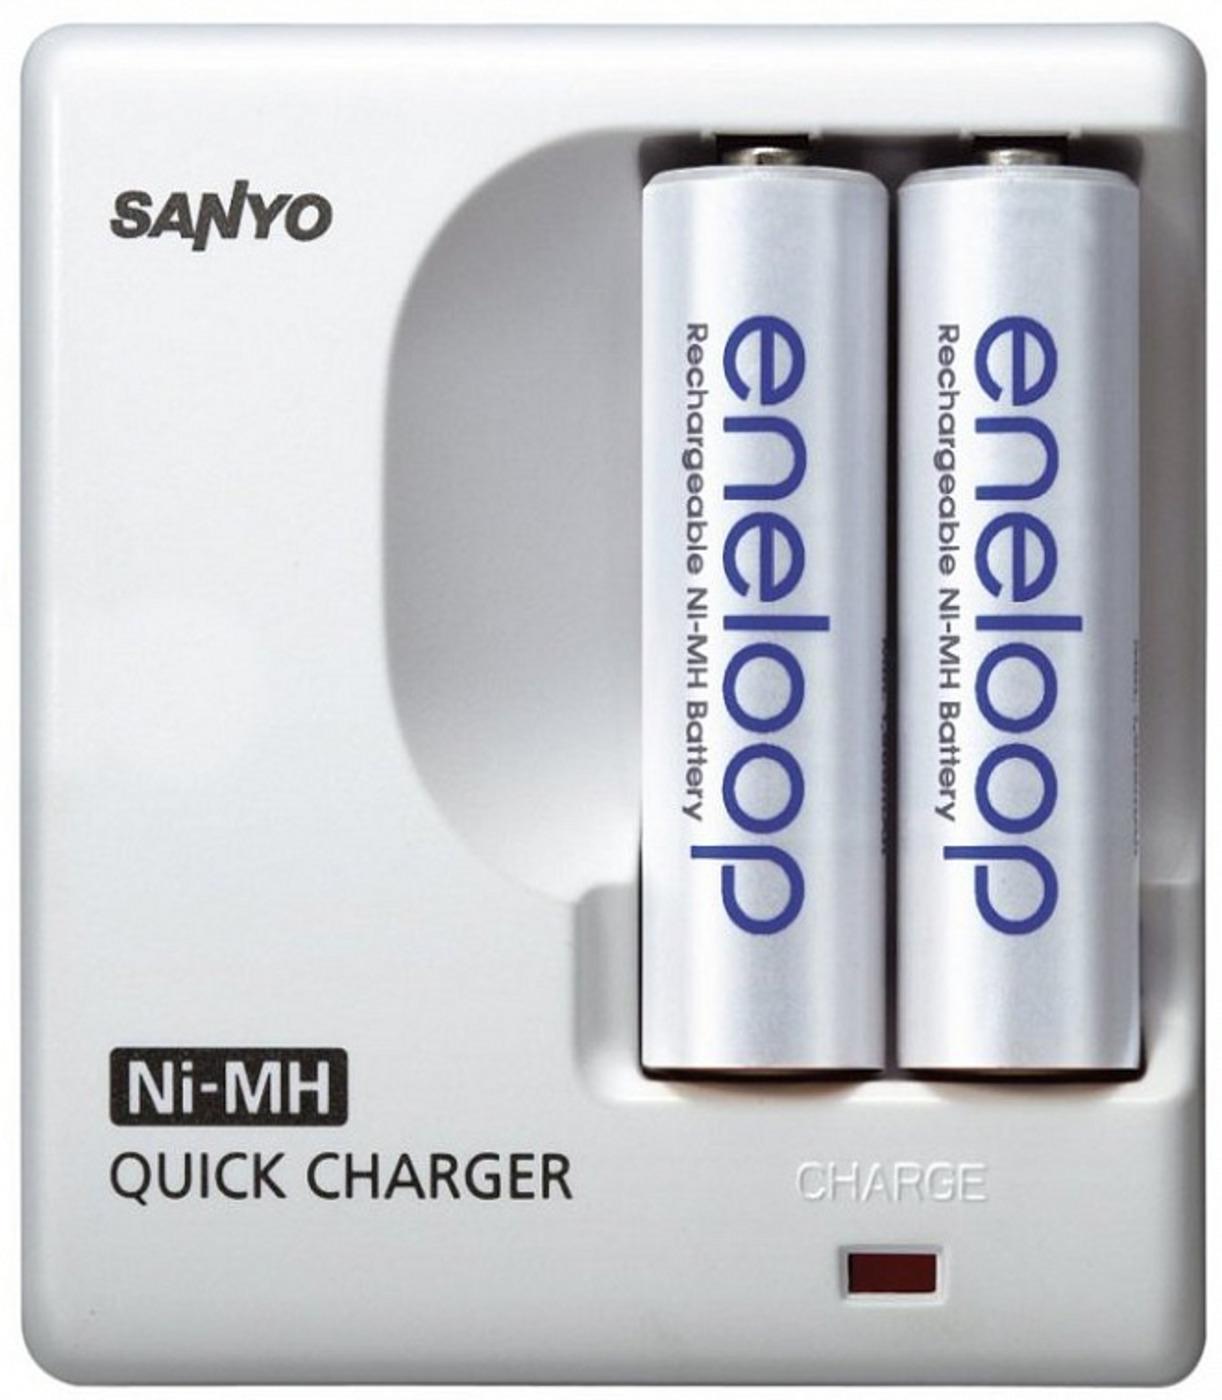 Sanyo Eneloop MDR02-E-2-4UTGB